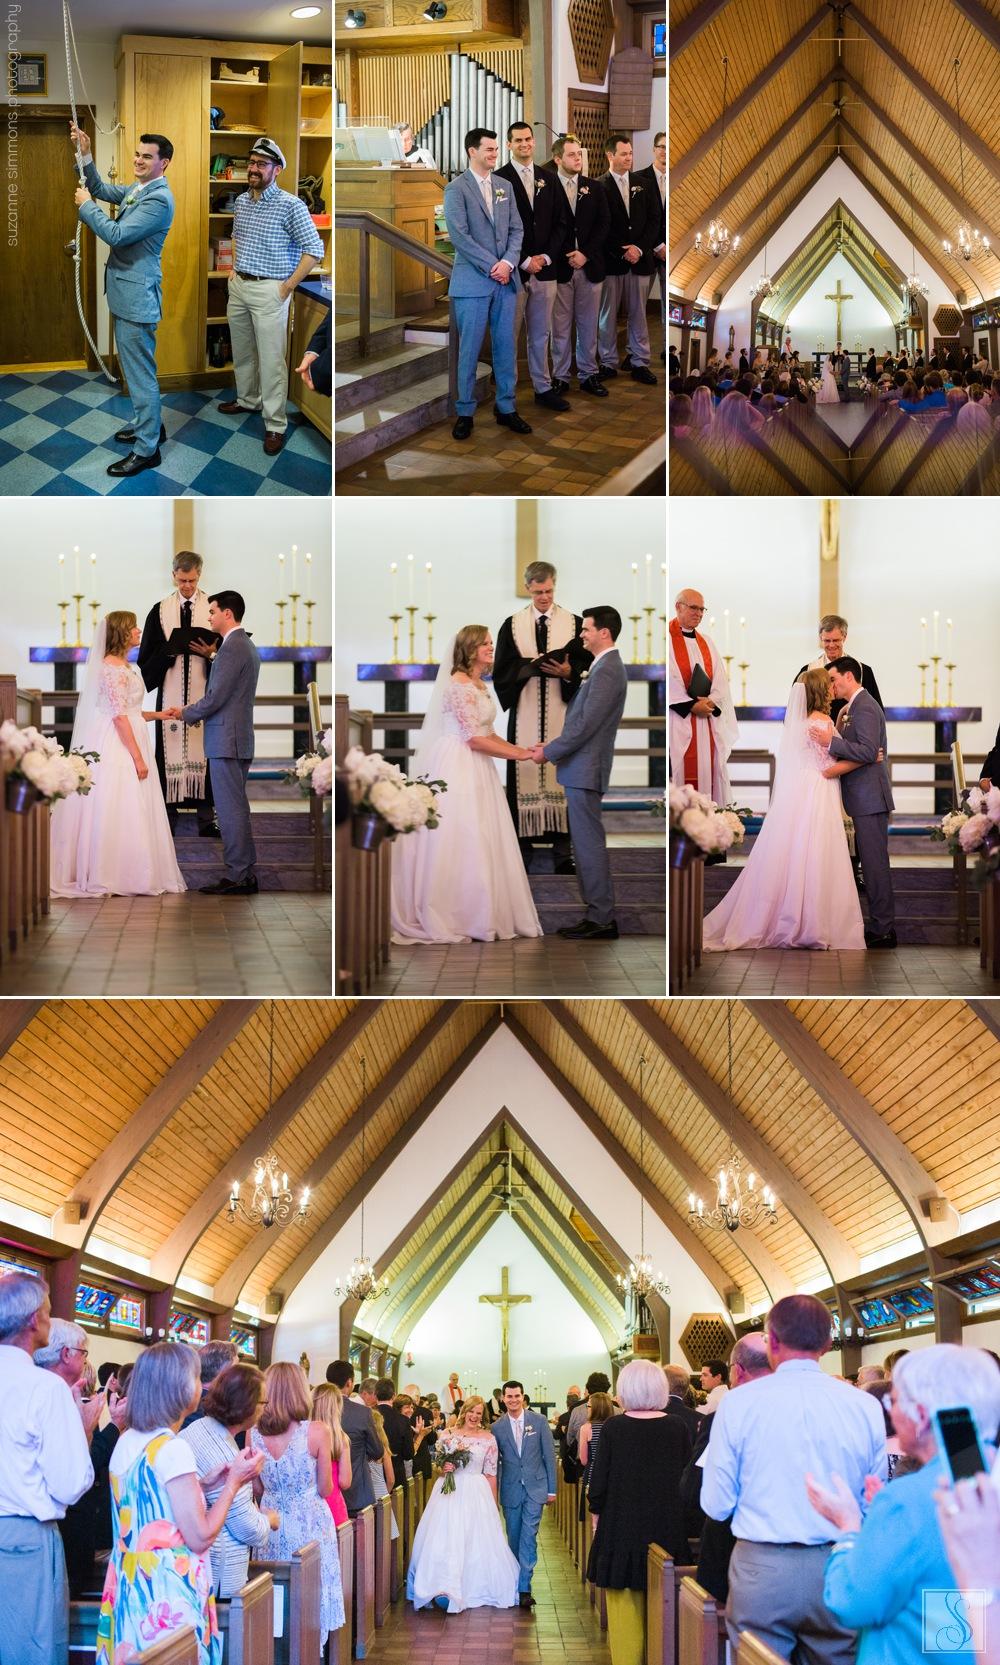 St. Albans wedding in Cape Elizabeth, Maine